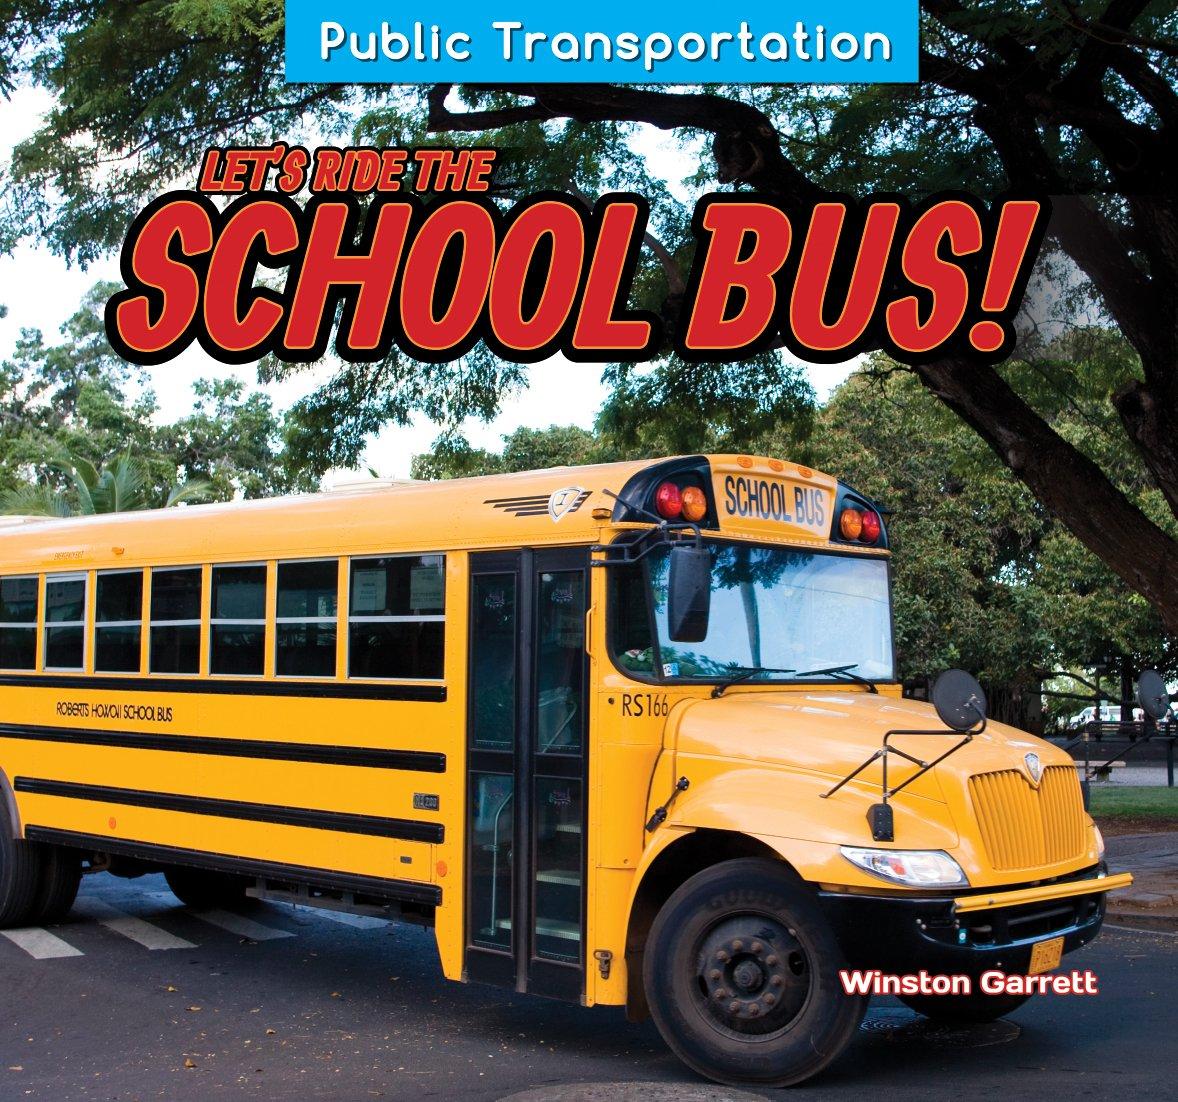 Let's Ride the School Bus! (Public Transportation) Paperback – August 1, 2014 Winston Garrett Powerkids Pr 1477765336 Technology - General